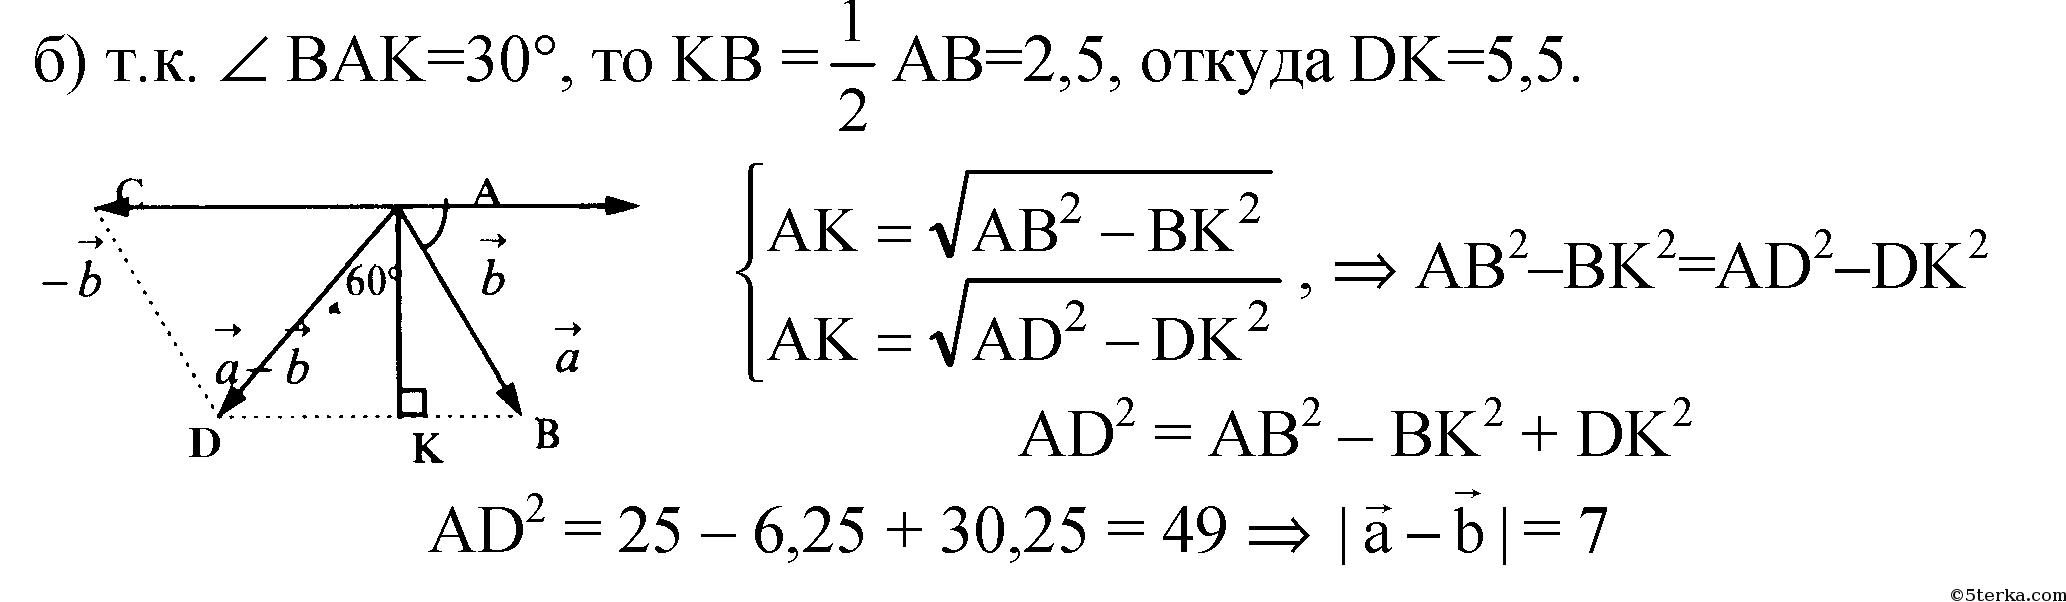 5терка гдз по геометрии 8 класс